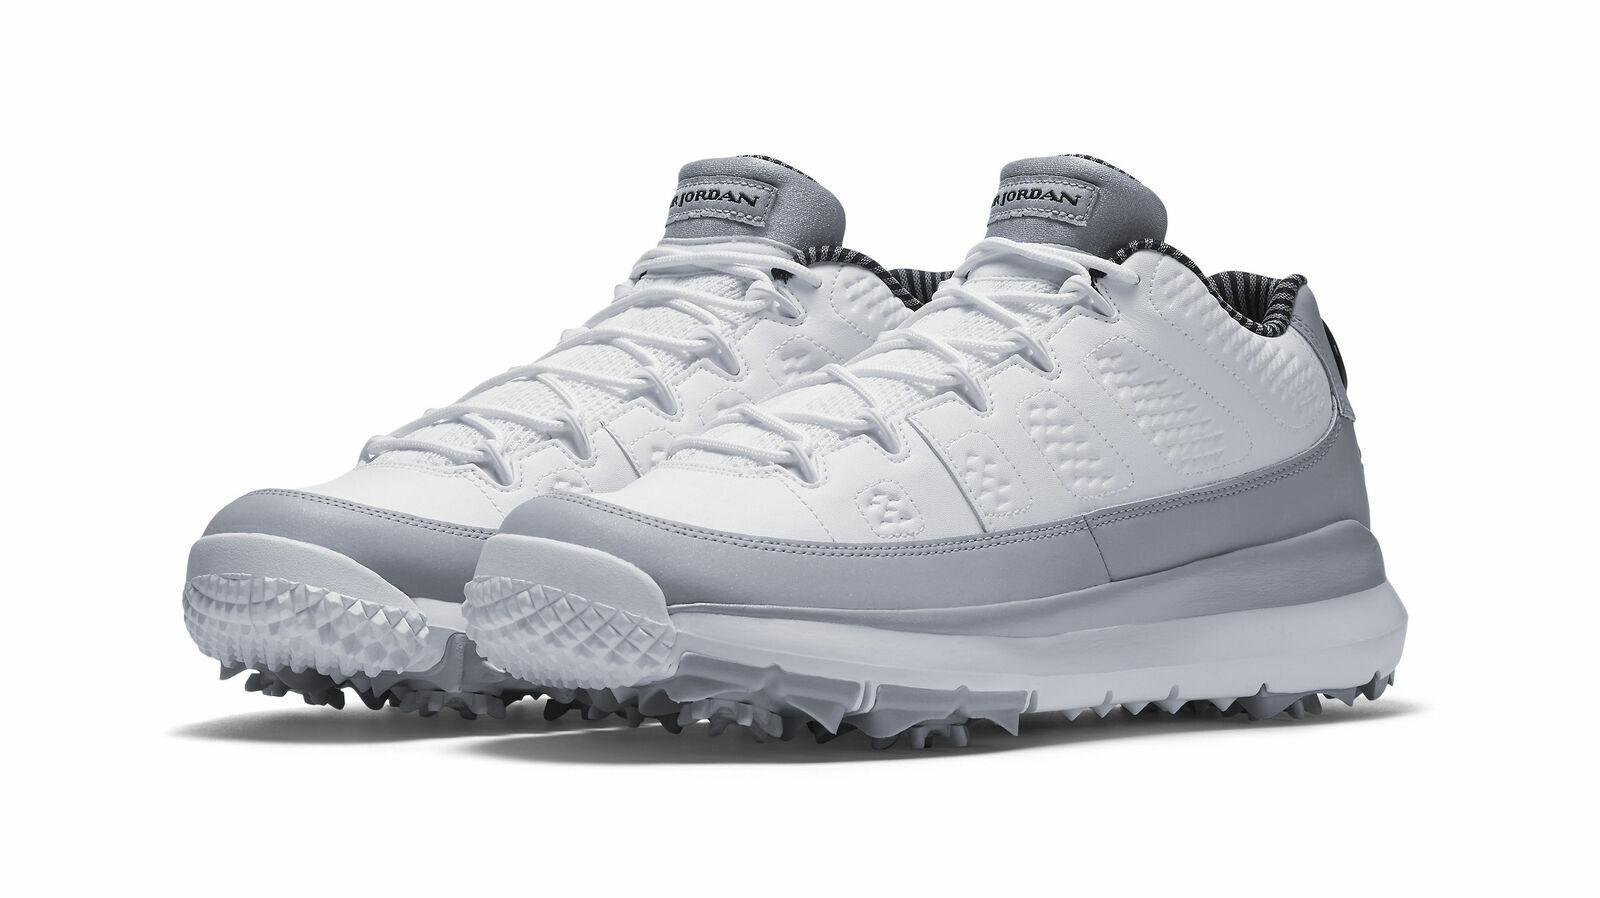 innovative design 8c9c4 d064d Size 9.5 Men Nike Air Jordan 9 IX Retro Golf Shoes Barons White Grey 833798  103